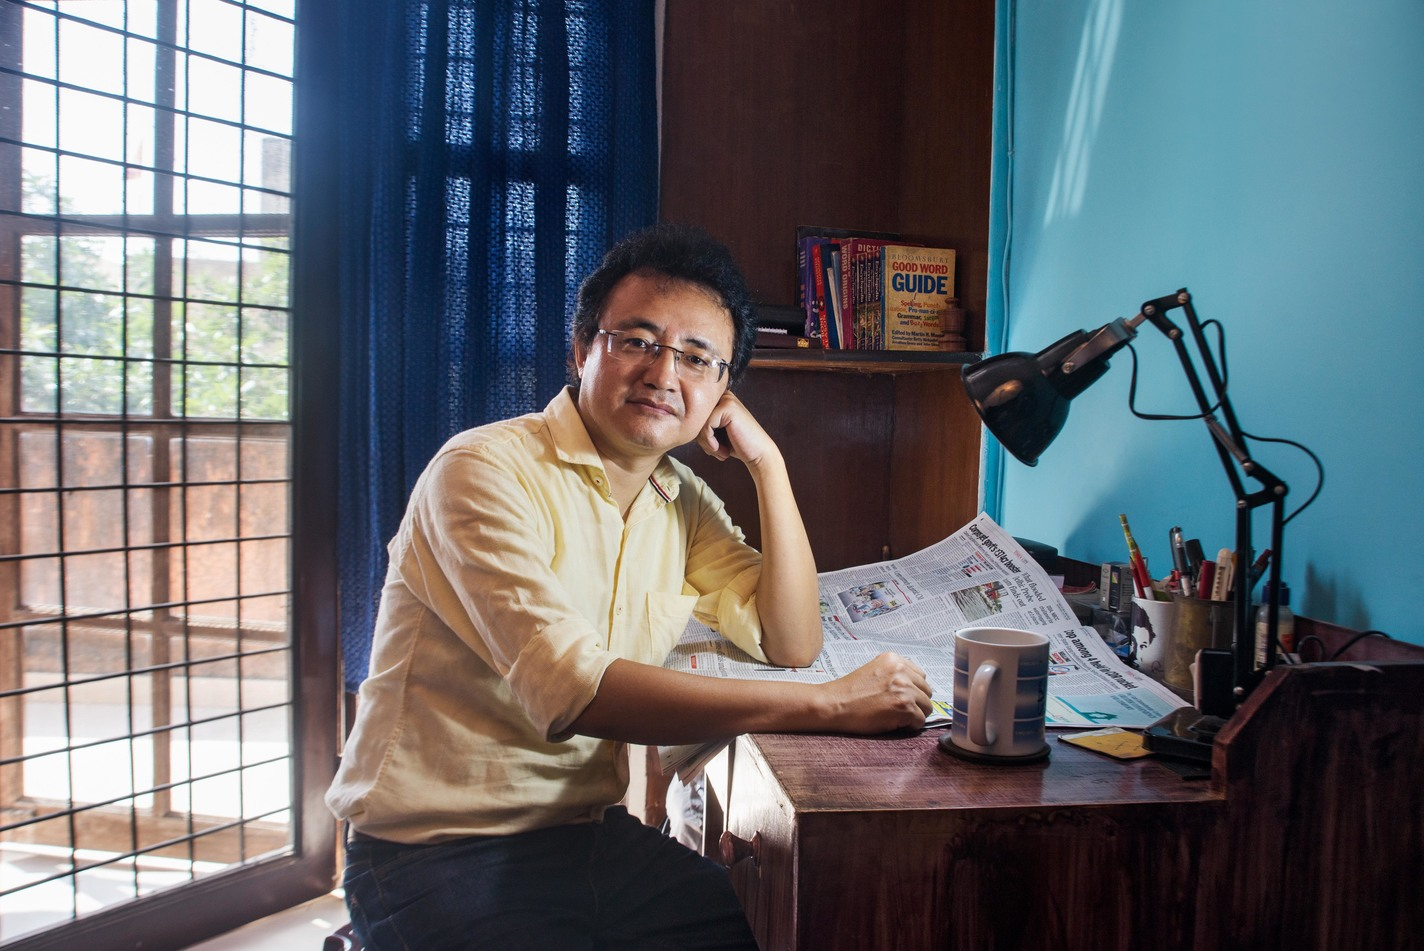 Joel Rai is a senior editor at Times of India and lives in Sarita Vihar, New Delhi. He is originally from Darjeeling